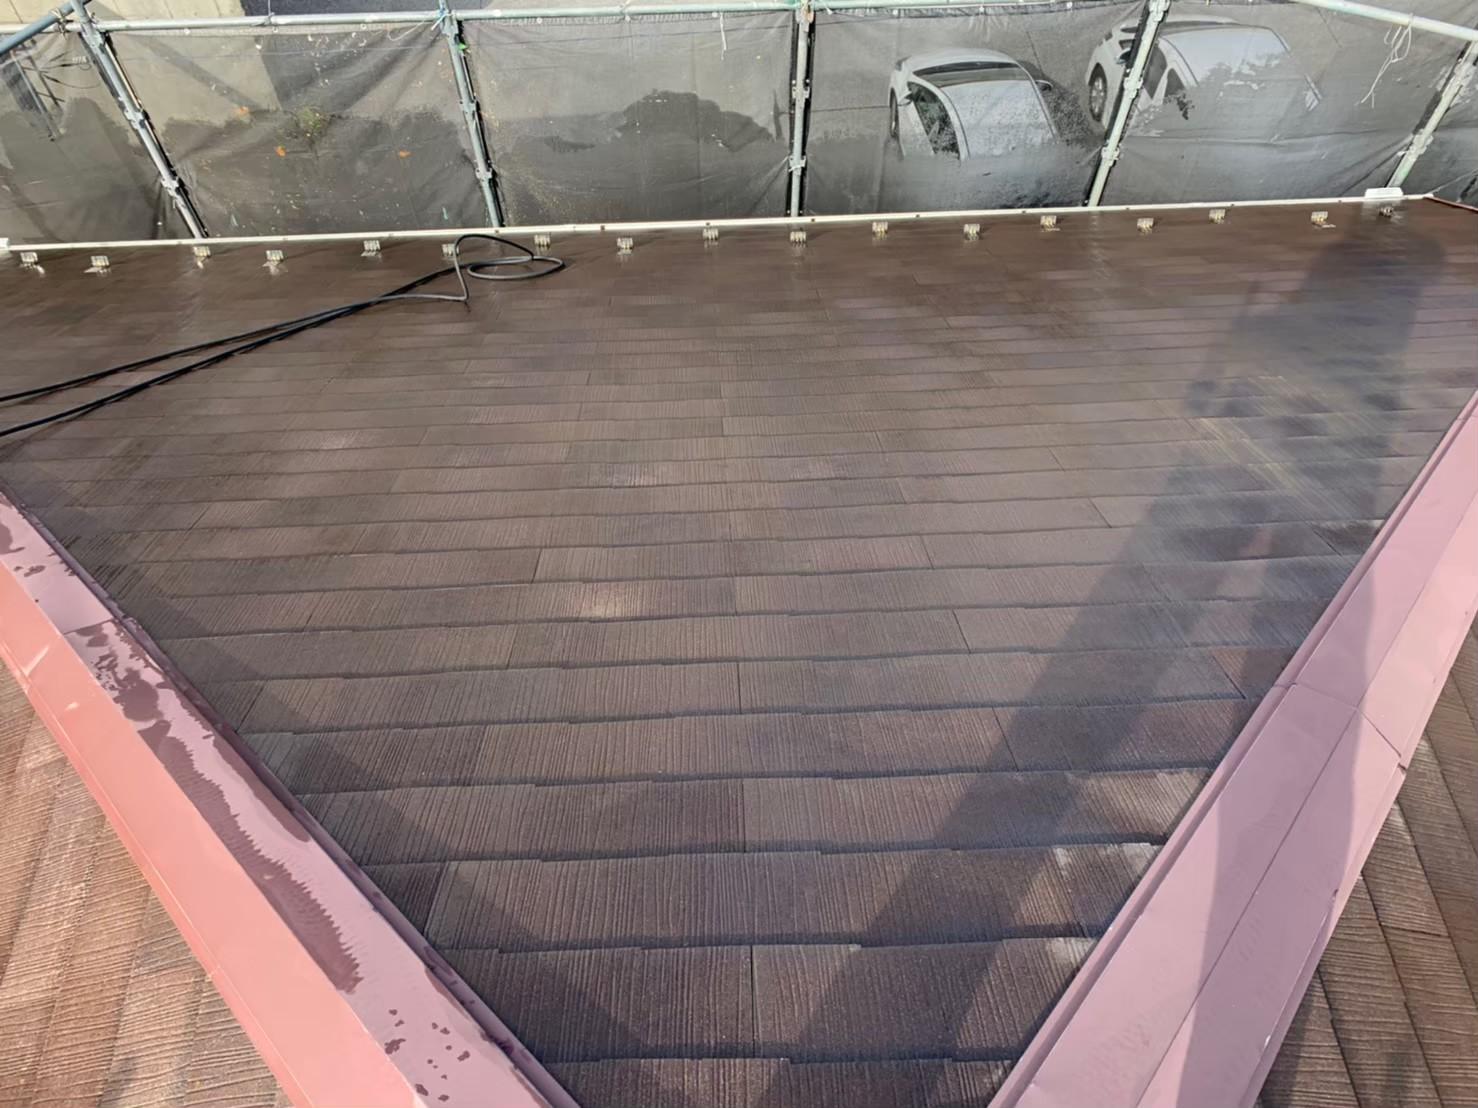 神奈川県秦野市屋根塗装工事 高圧洗浄後の屋根の画像